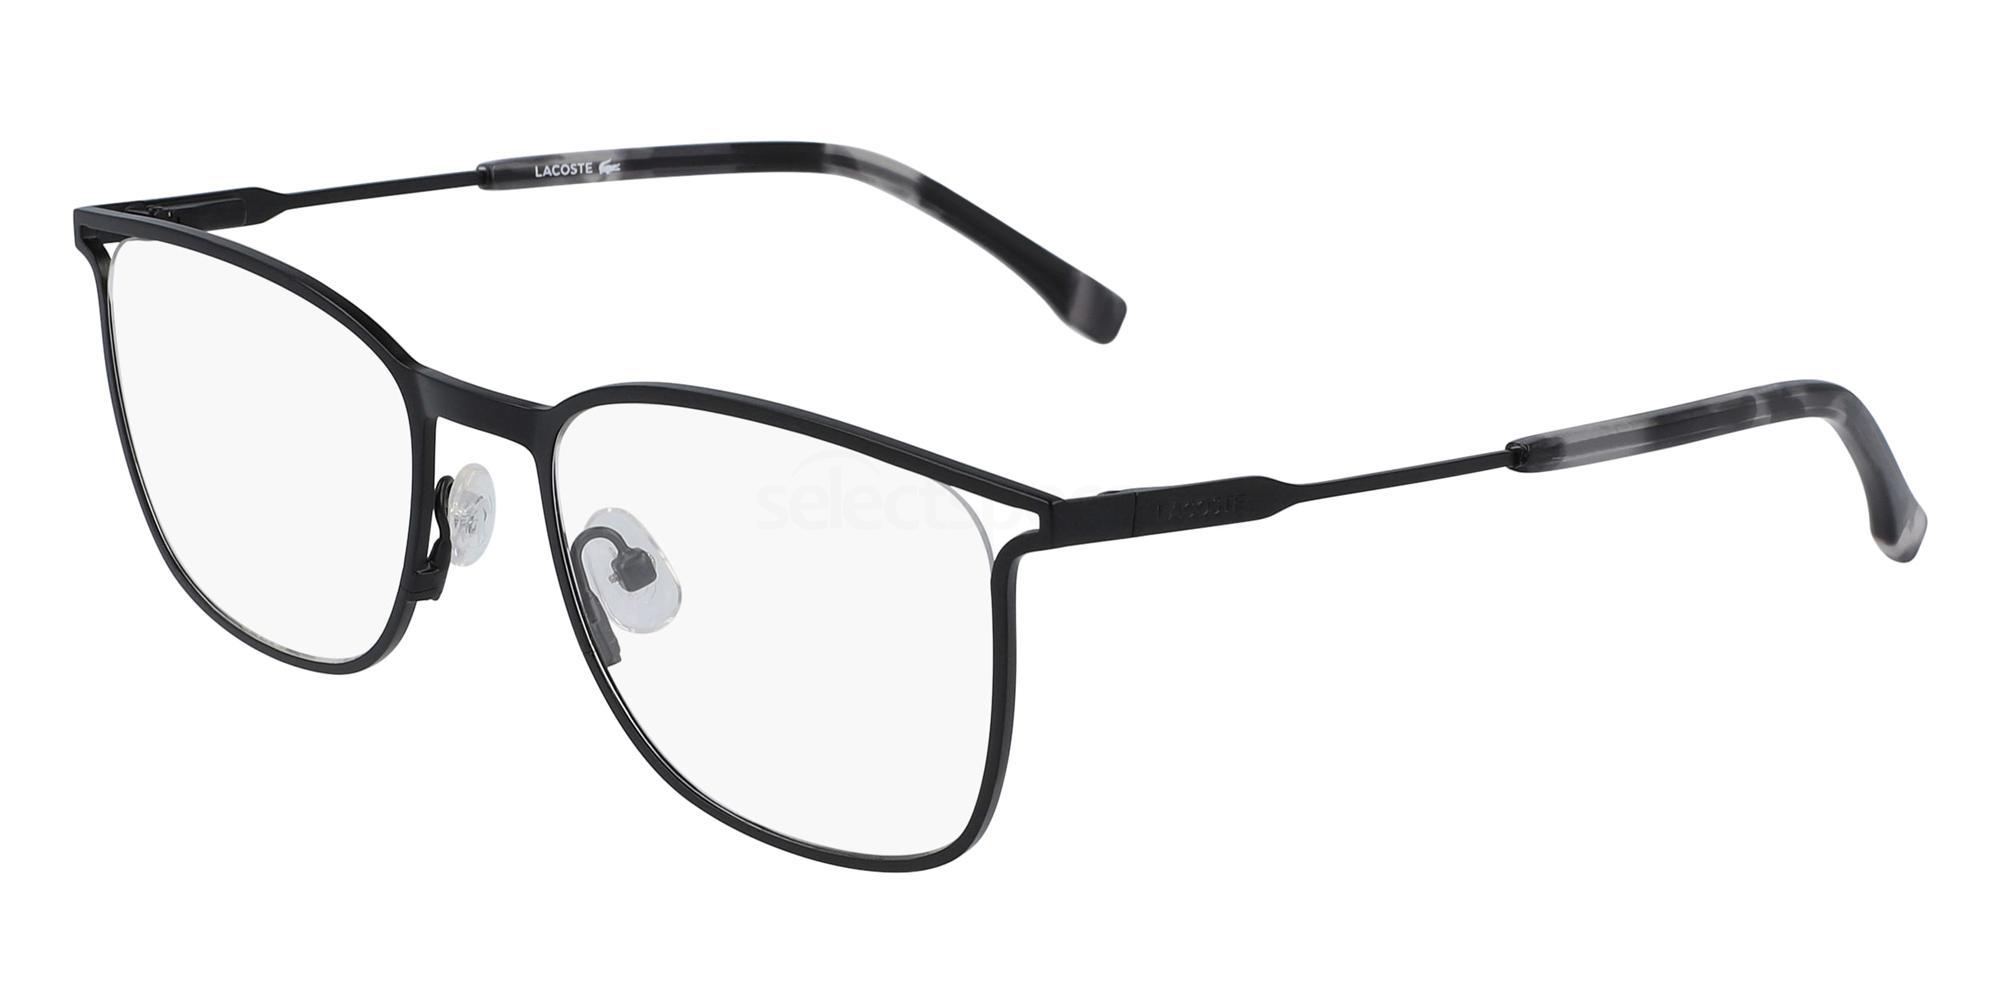 001 L2261 Glasses, Lacoste